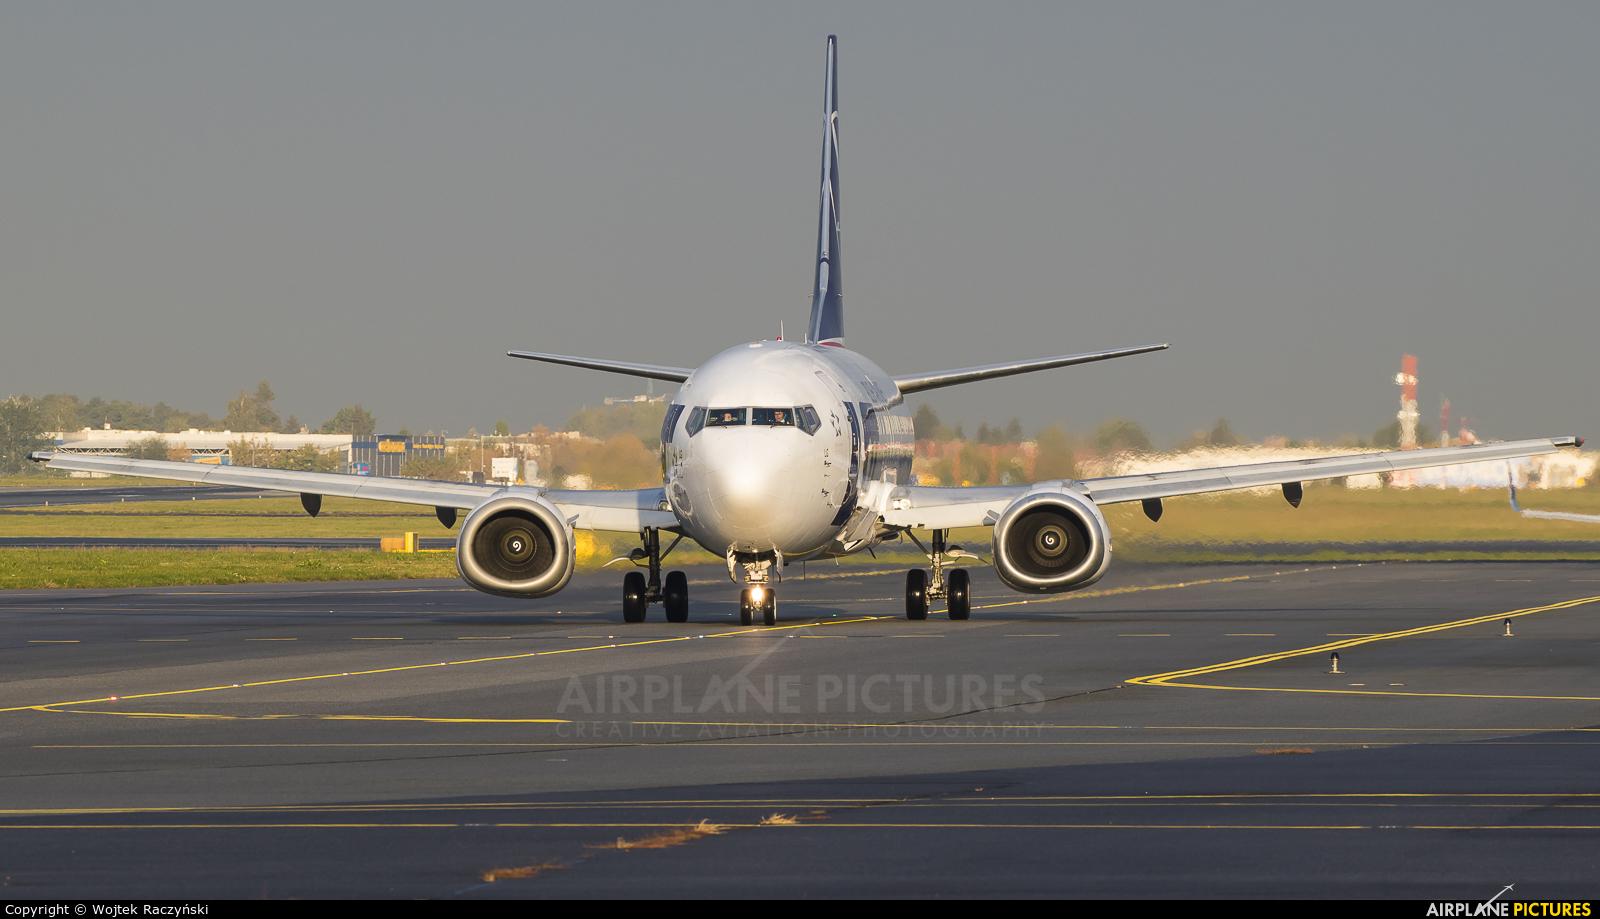 LOT - Polish Airlines SP-LLG aircraft at Warsaw - Frederic Chopin